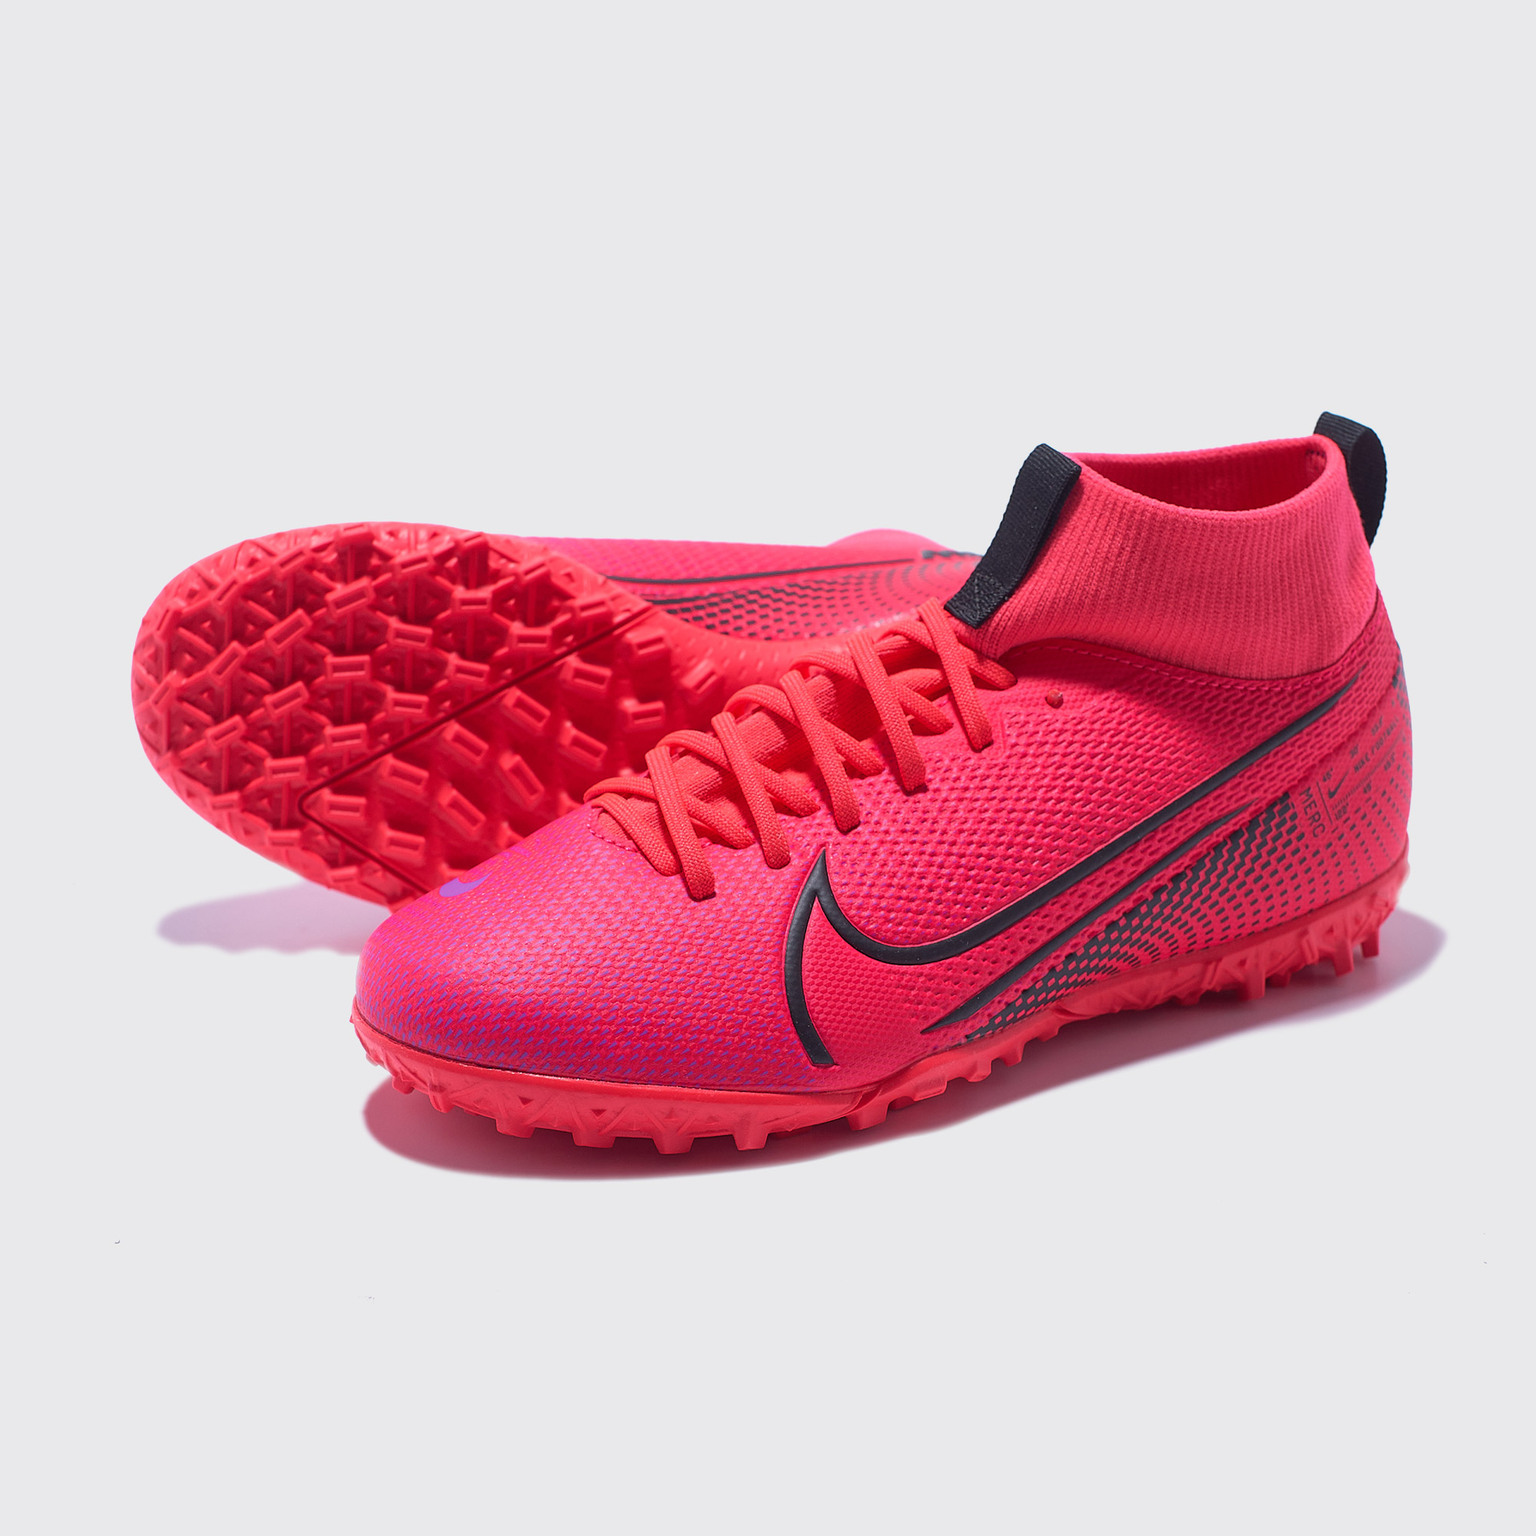 Шиповки детские Nike Superfly 7 Academy TF AT8143-606 шиповки детские nike legend 8 academy tf at5736 606